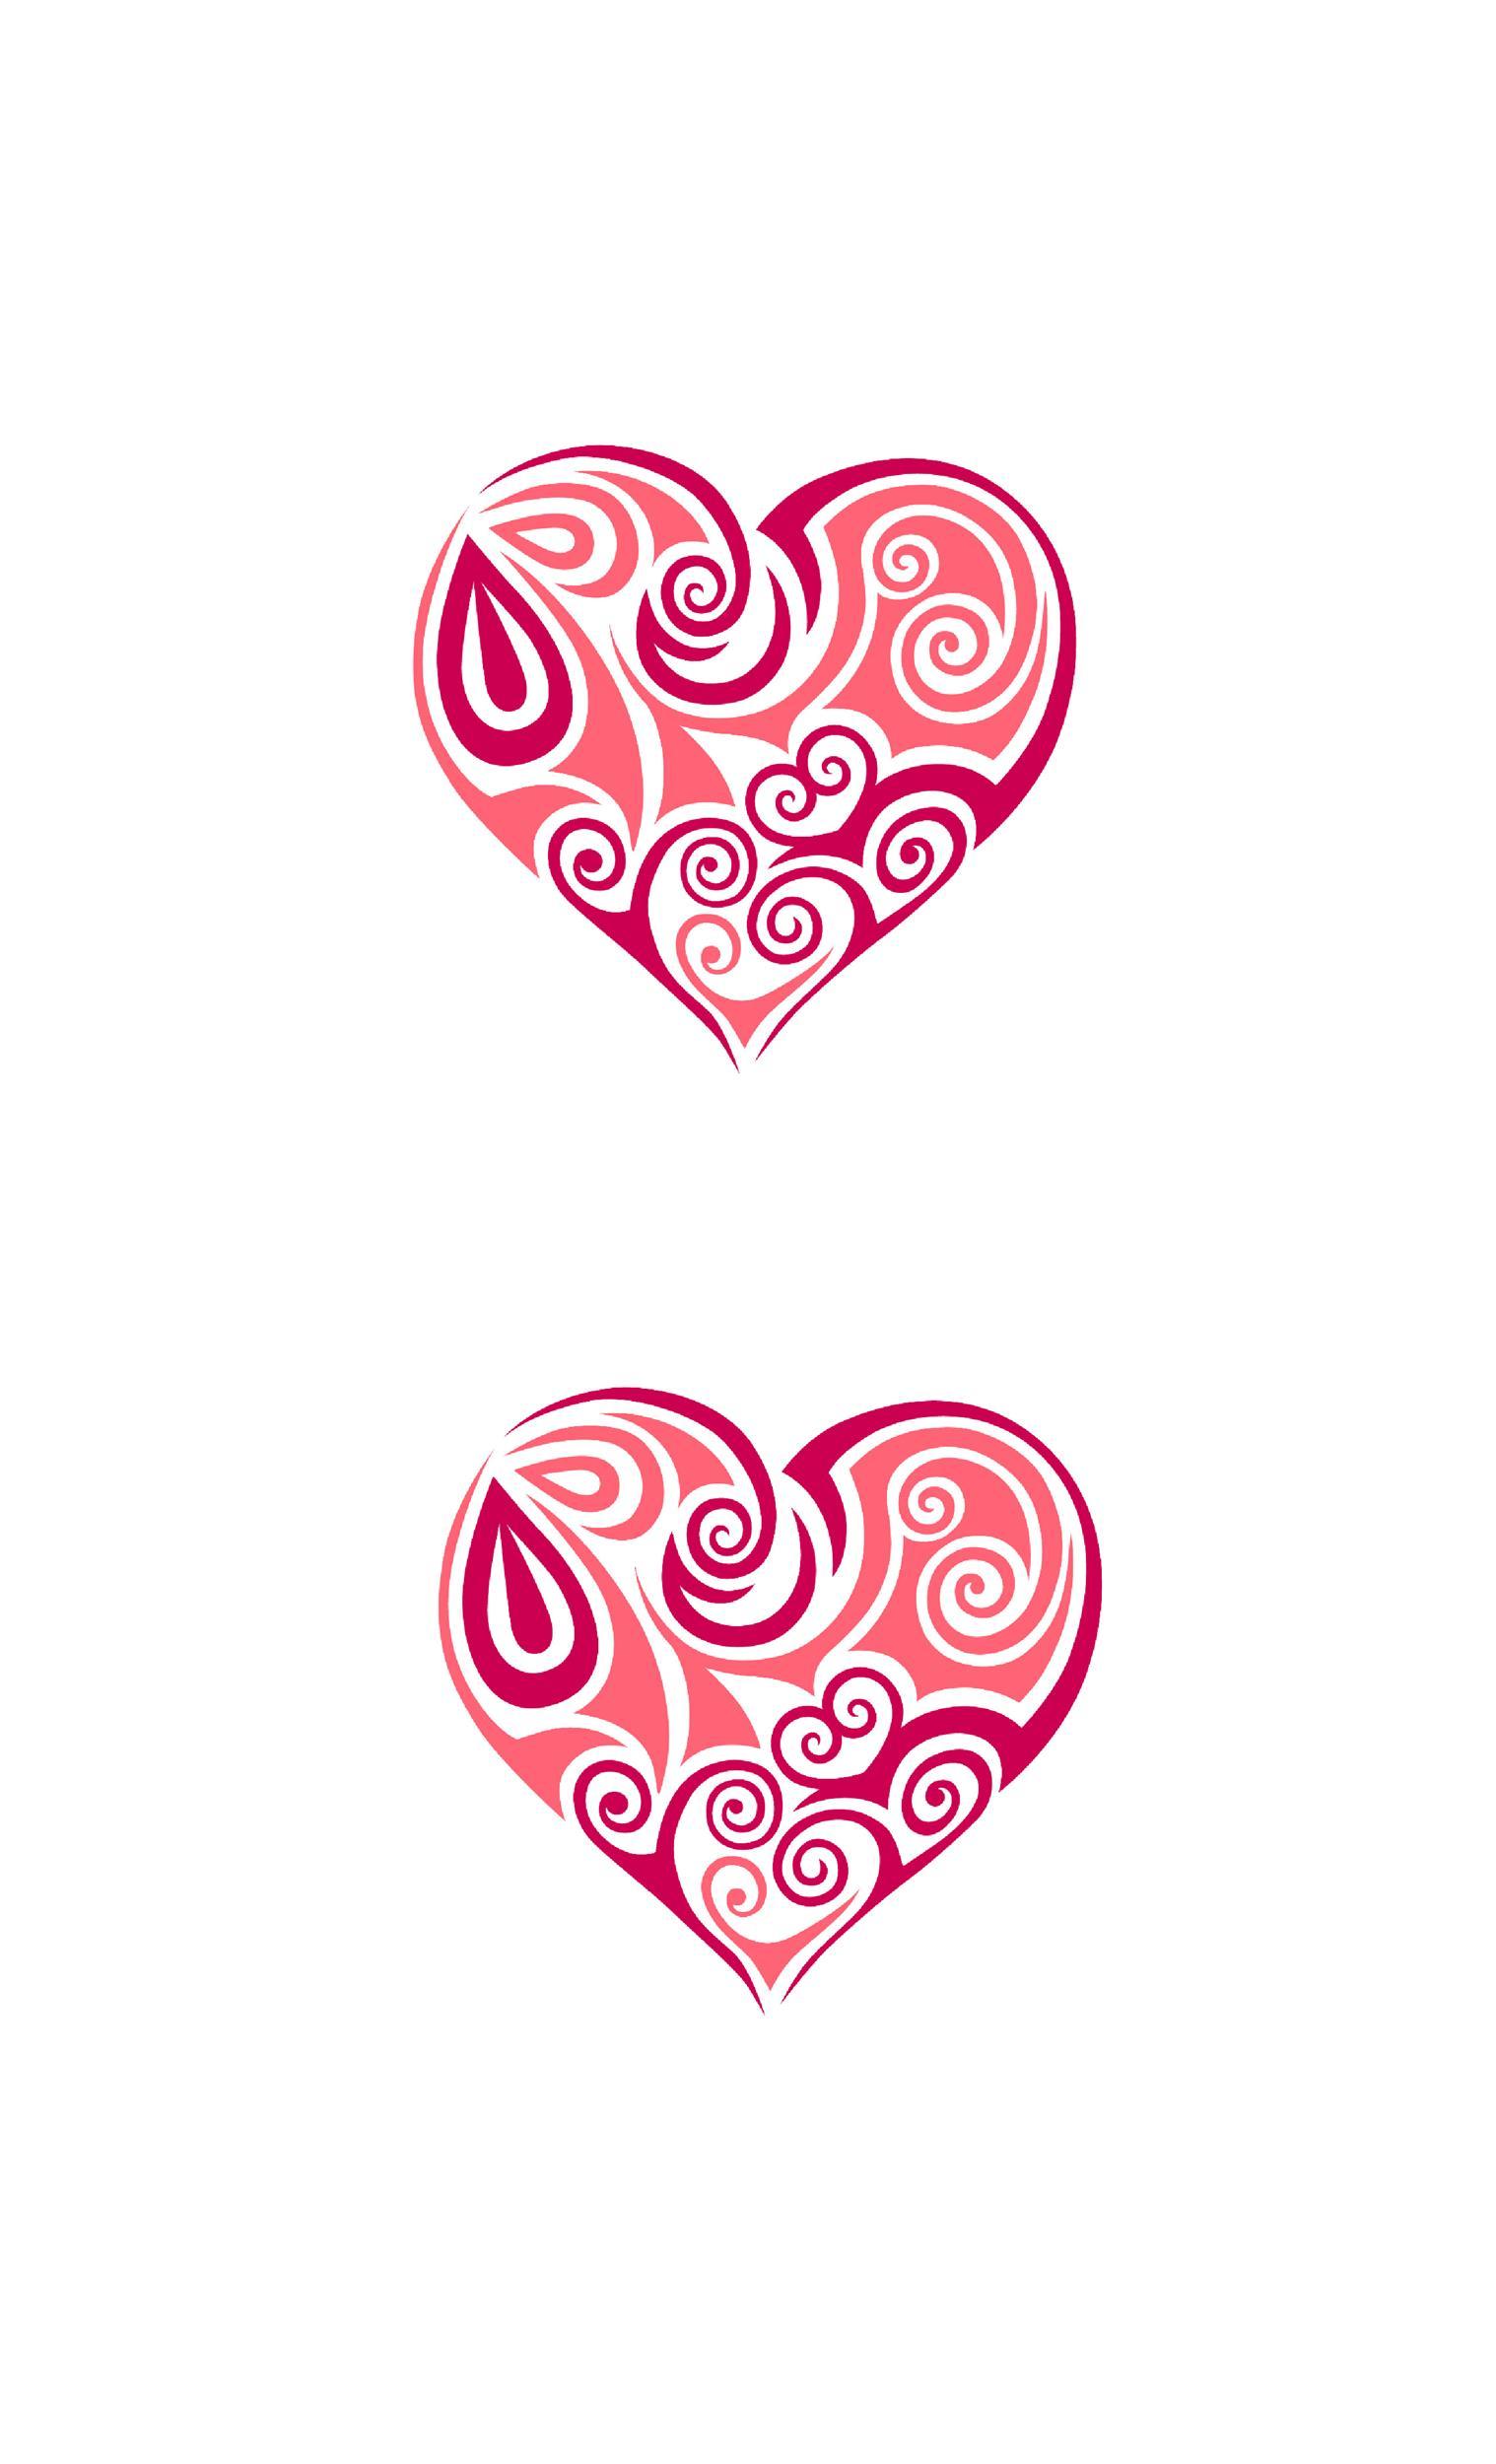 40 Printable Heart Templates  U0026 15 Usage Examples